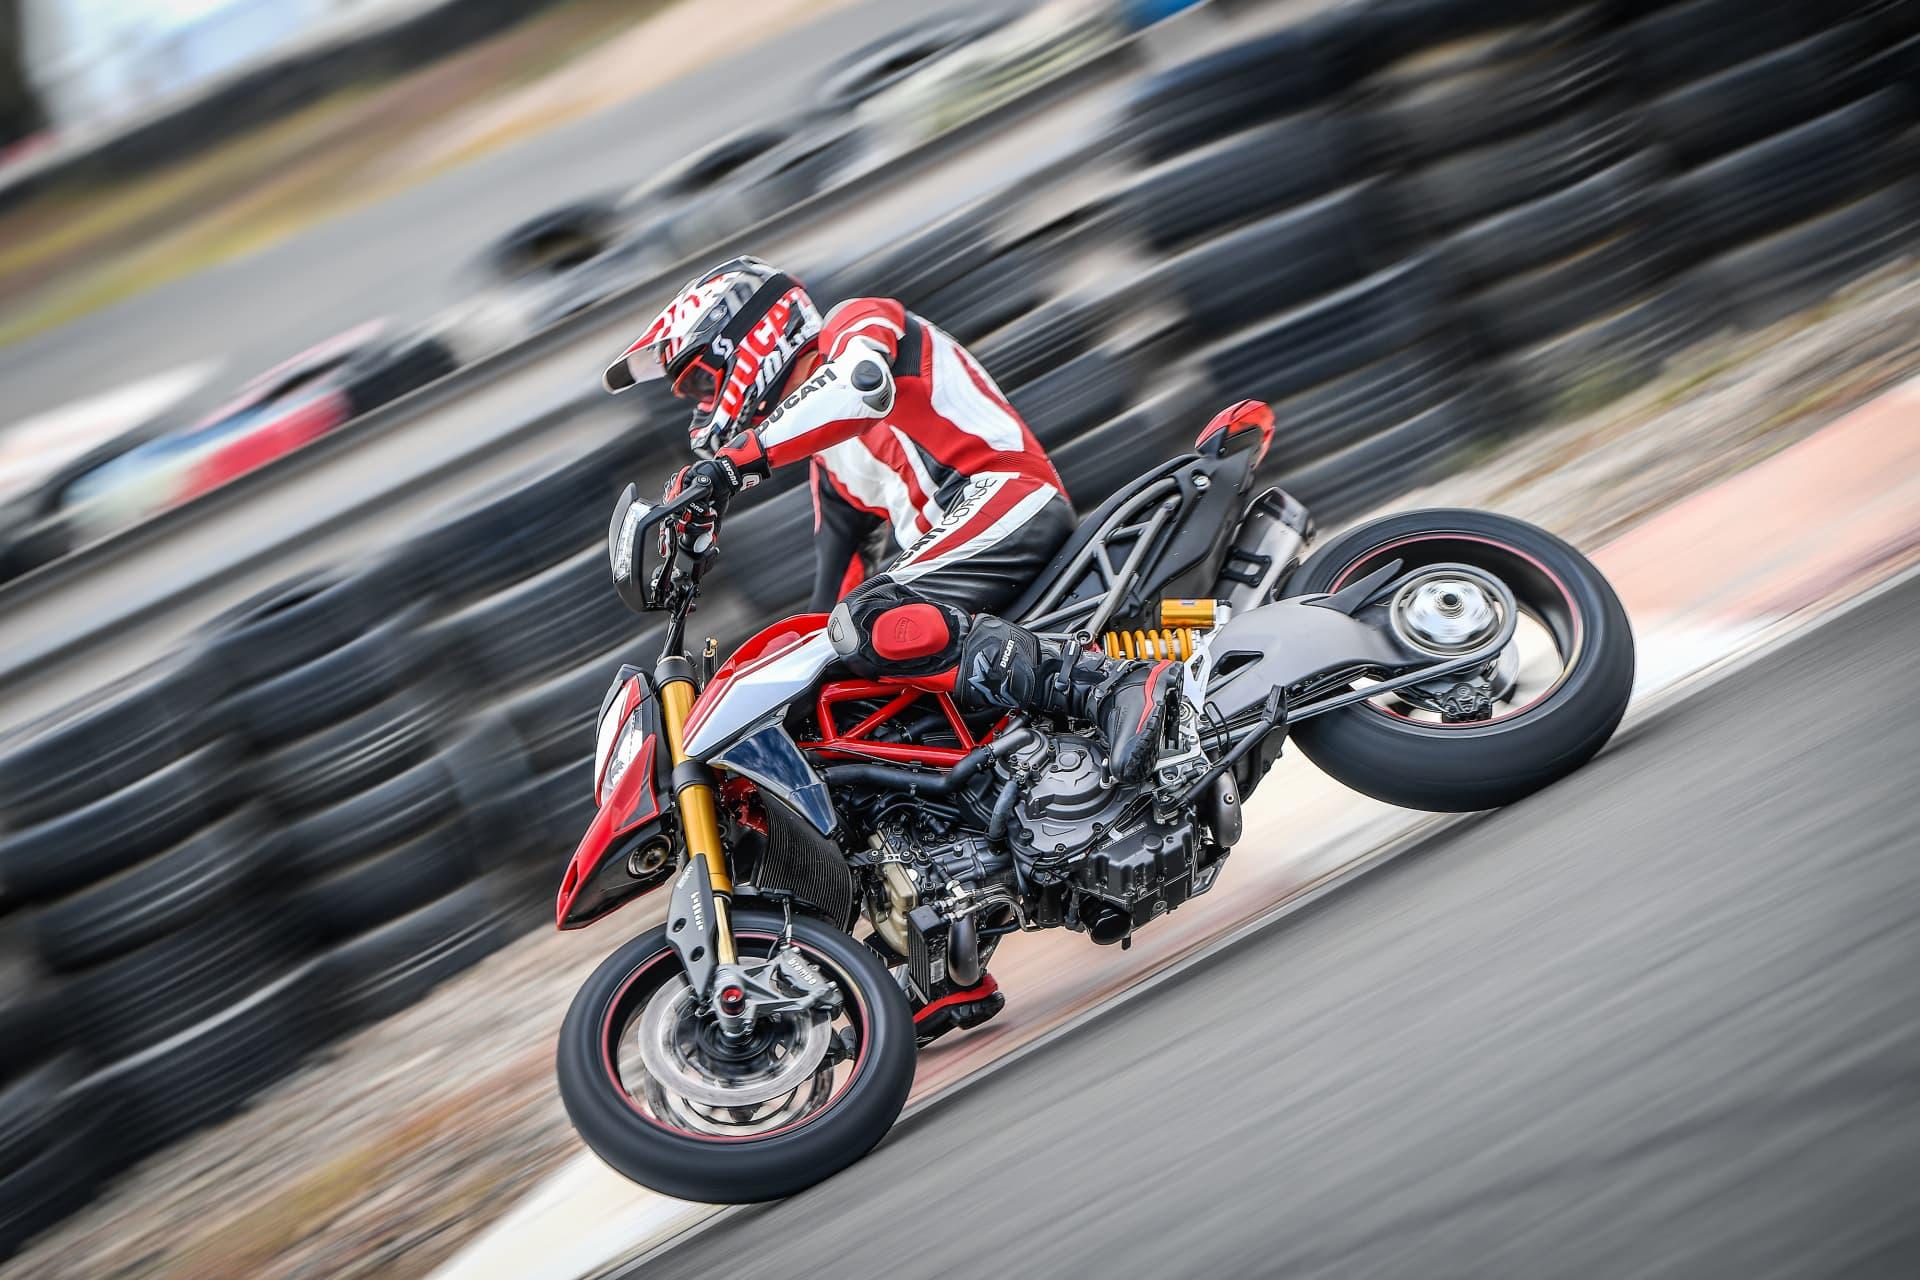 Ducati Hypermotard 950 Sp Performance 03 Uc70334 Mid